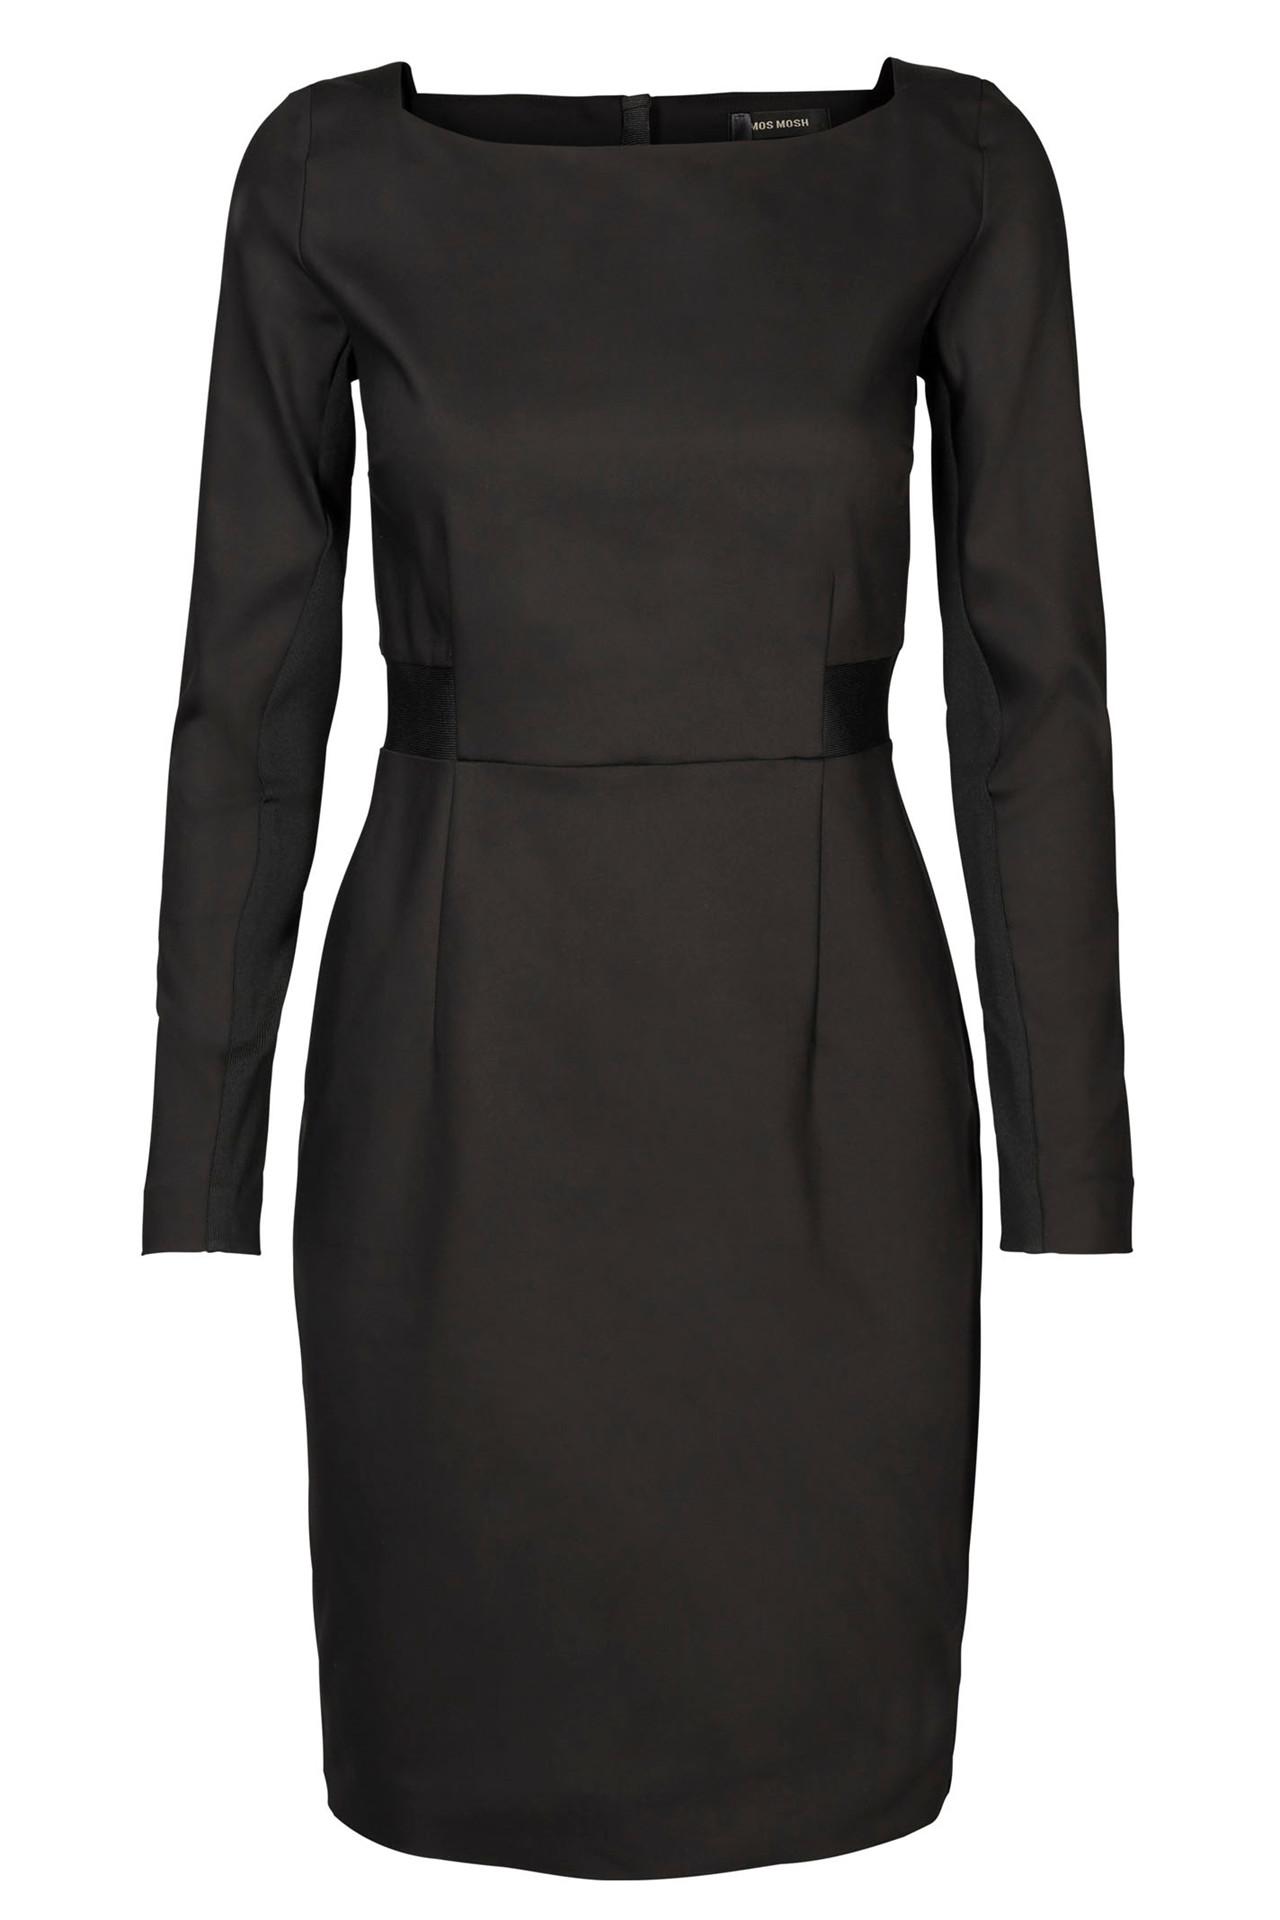 e4d5b8cc BLAKE NIGHT DRESS 120590 SORT kjole fra Mos Mosh - Køb kjole online her